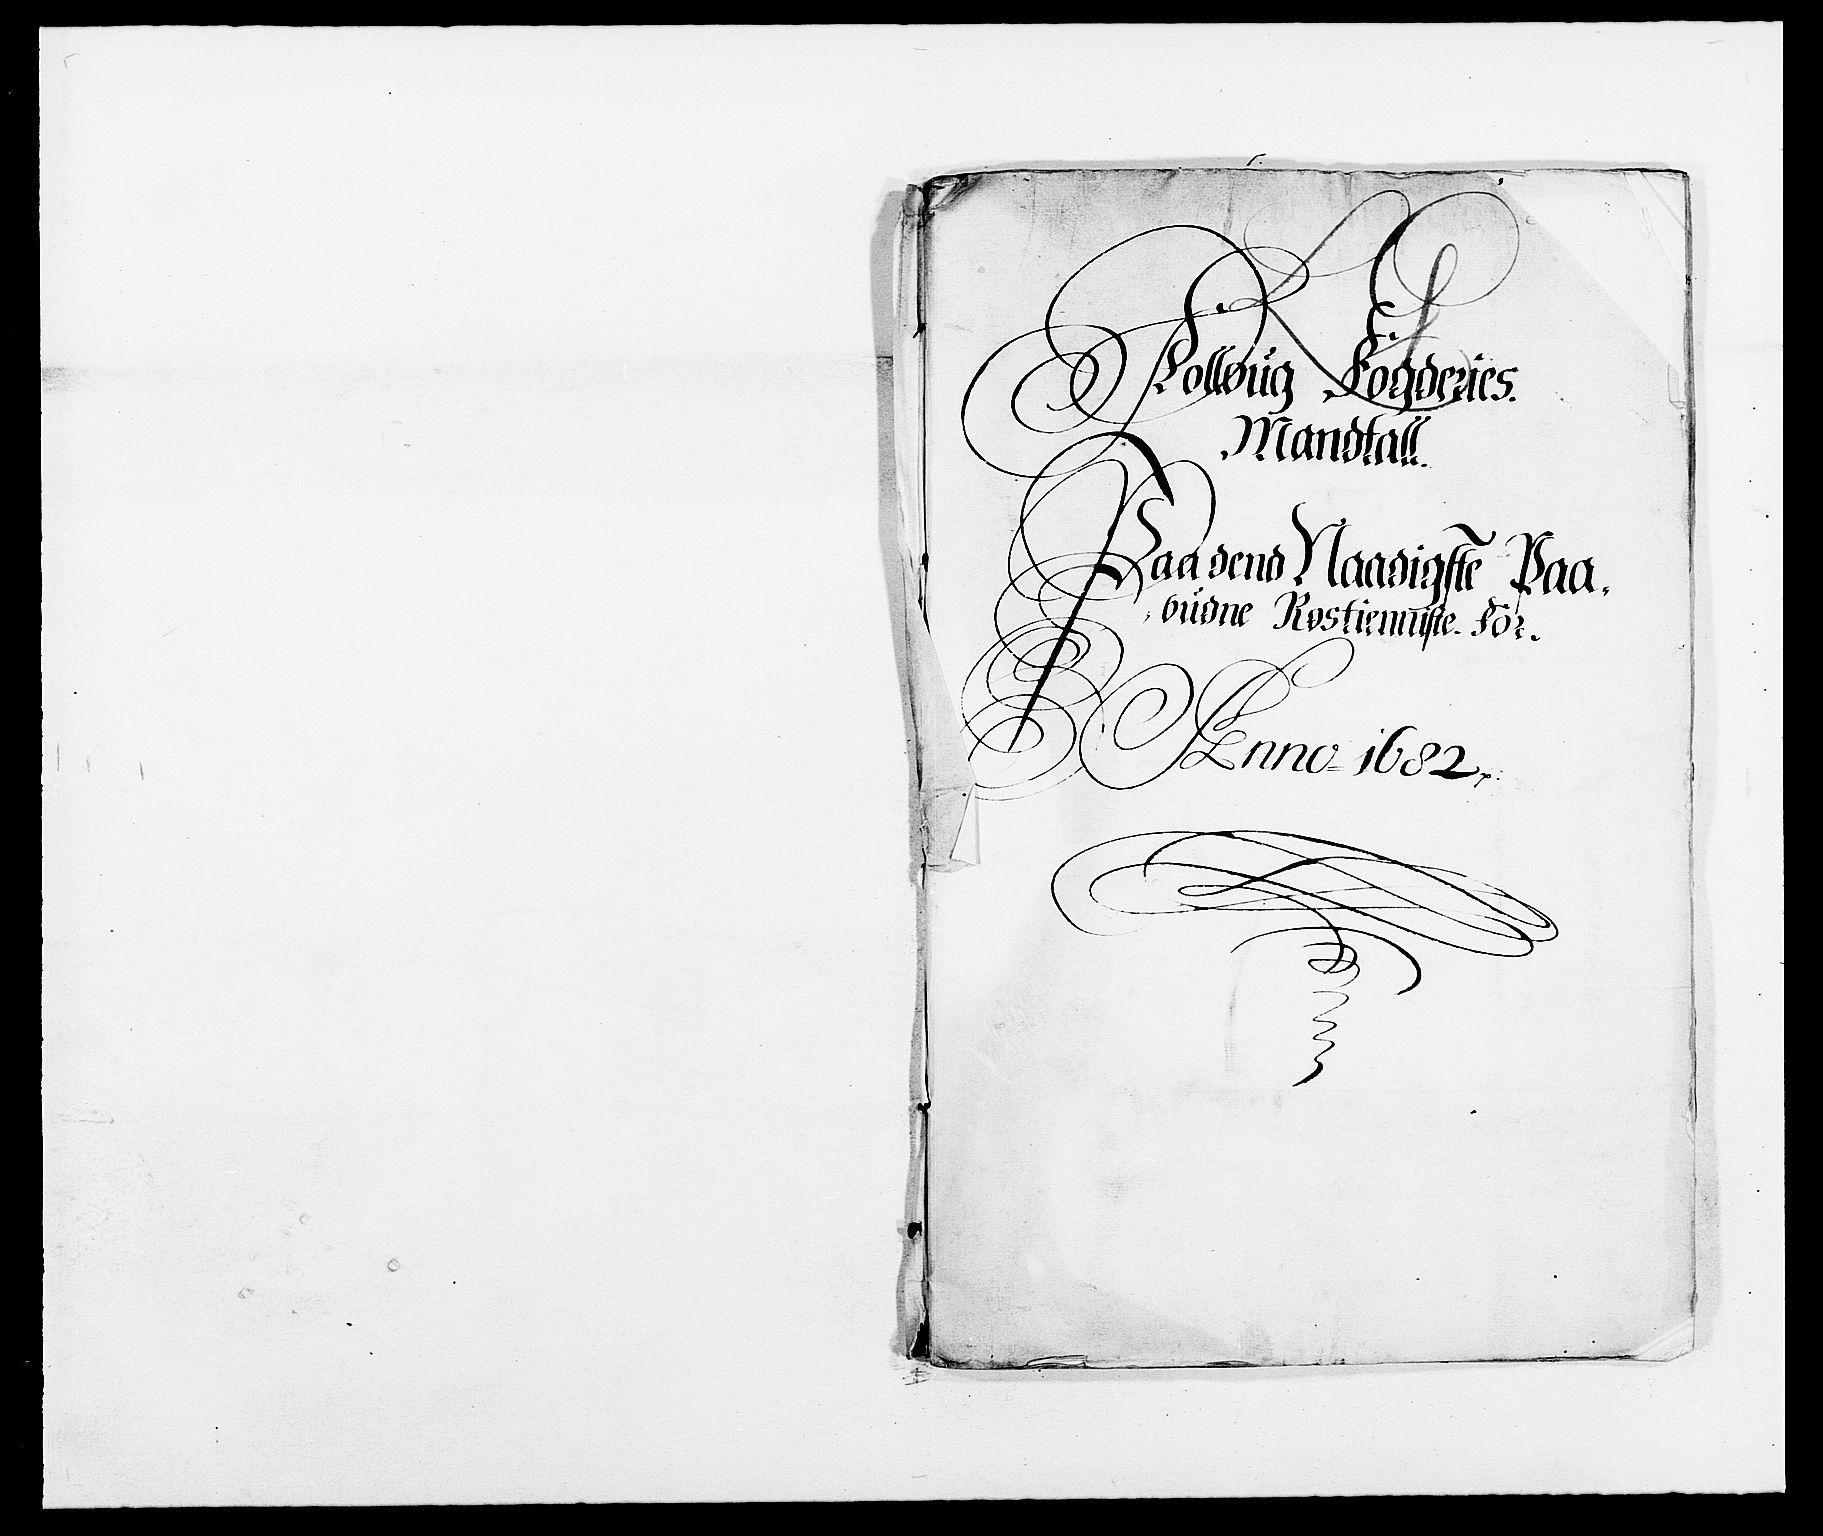 RA, Rentekammeret inntil 1814, Reviderte regnskaper, Fogderegnskap, R09/L0430: Fogderegnskap Follo, 1682-1683, s. 201